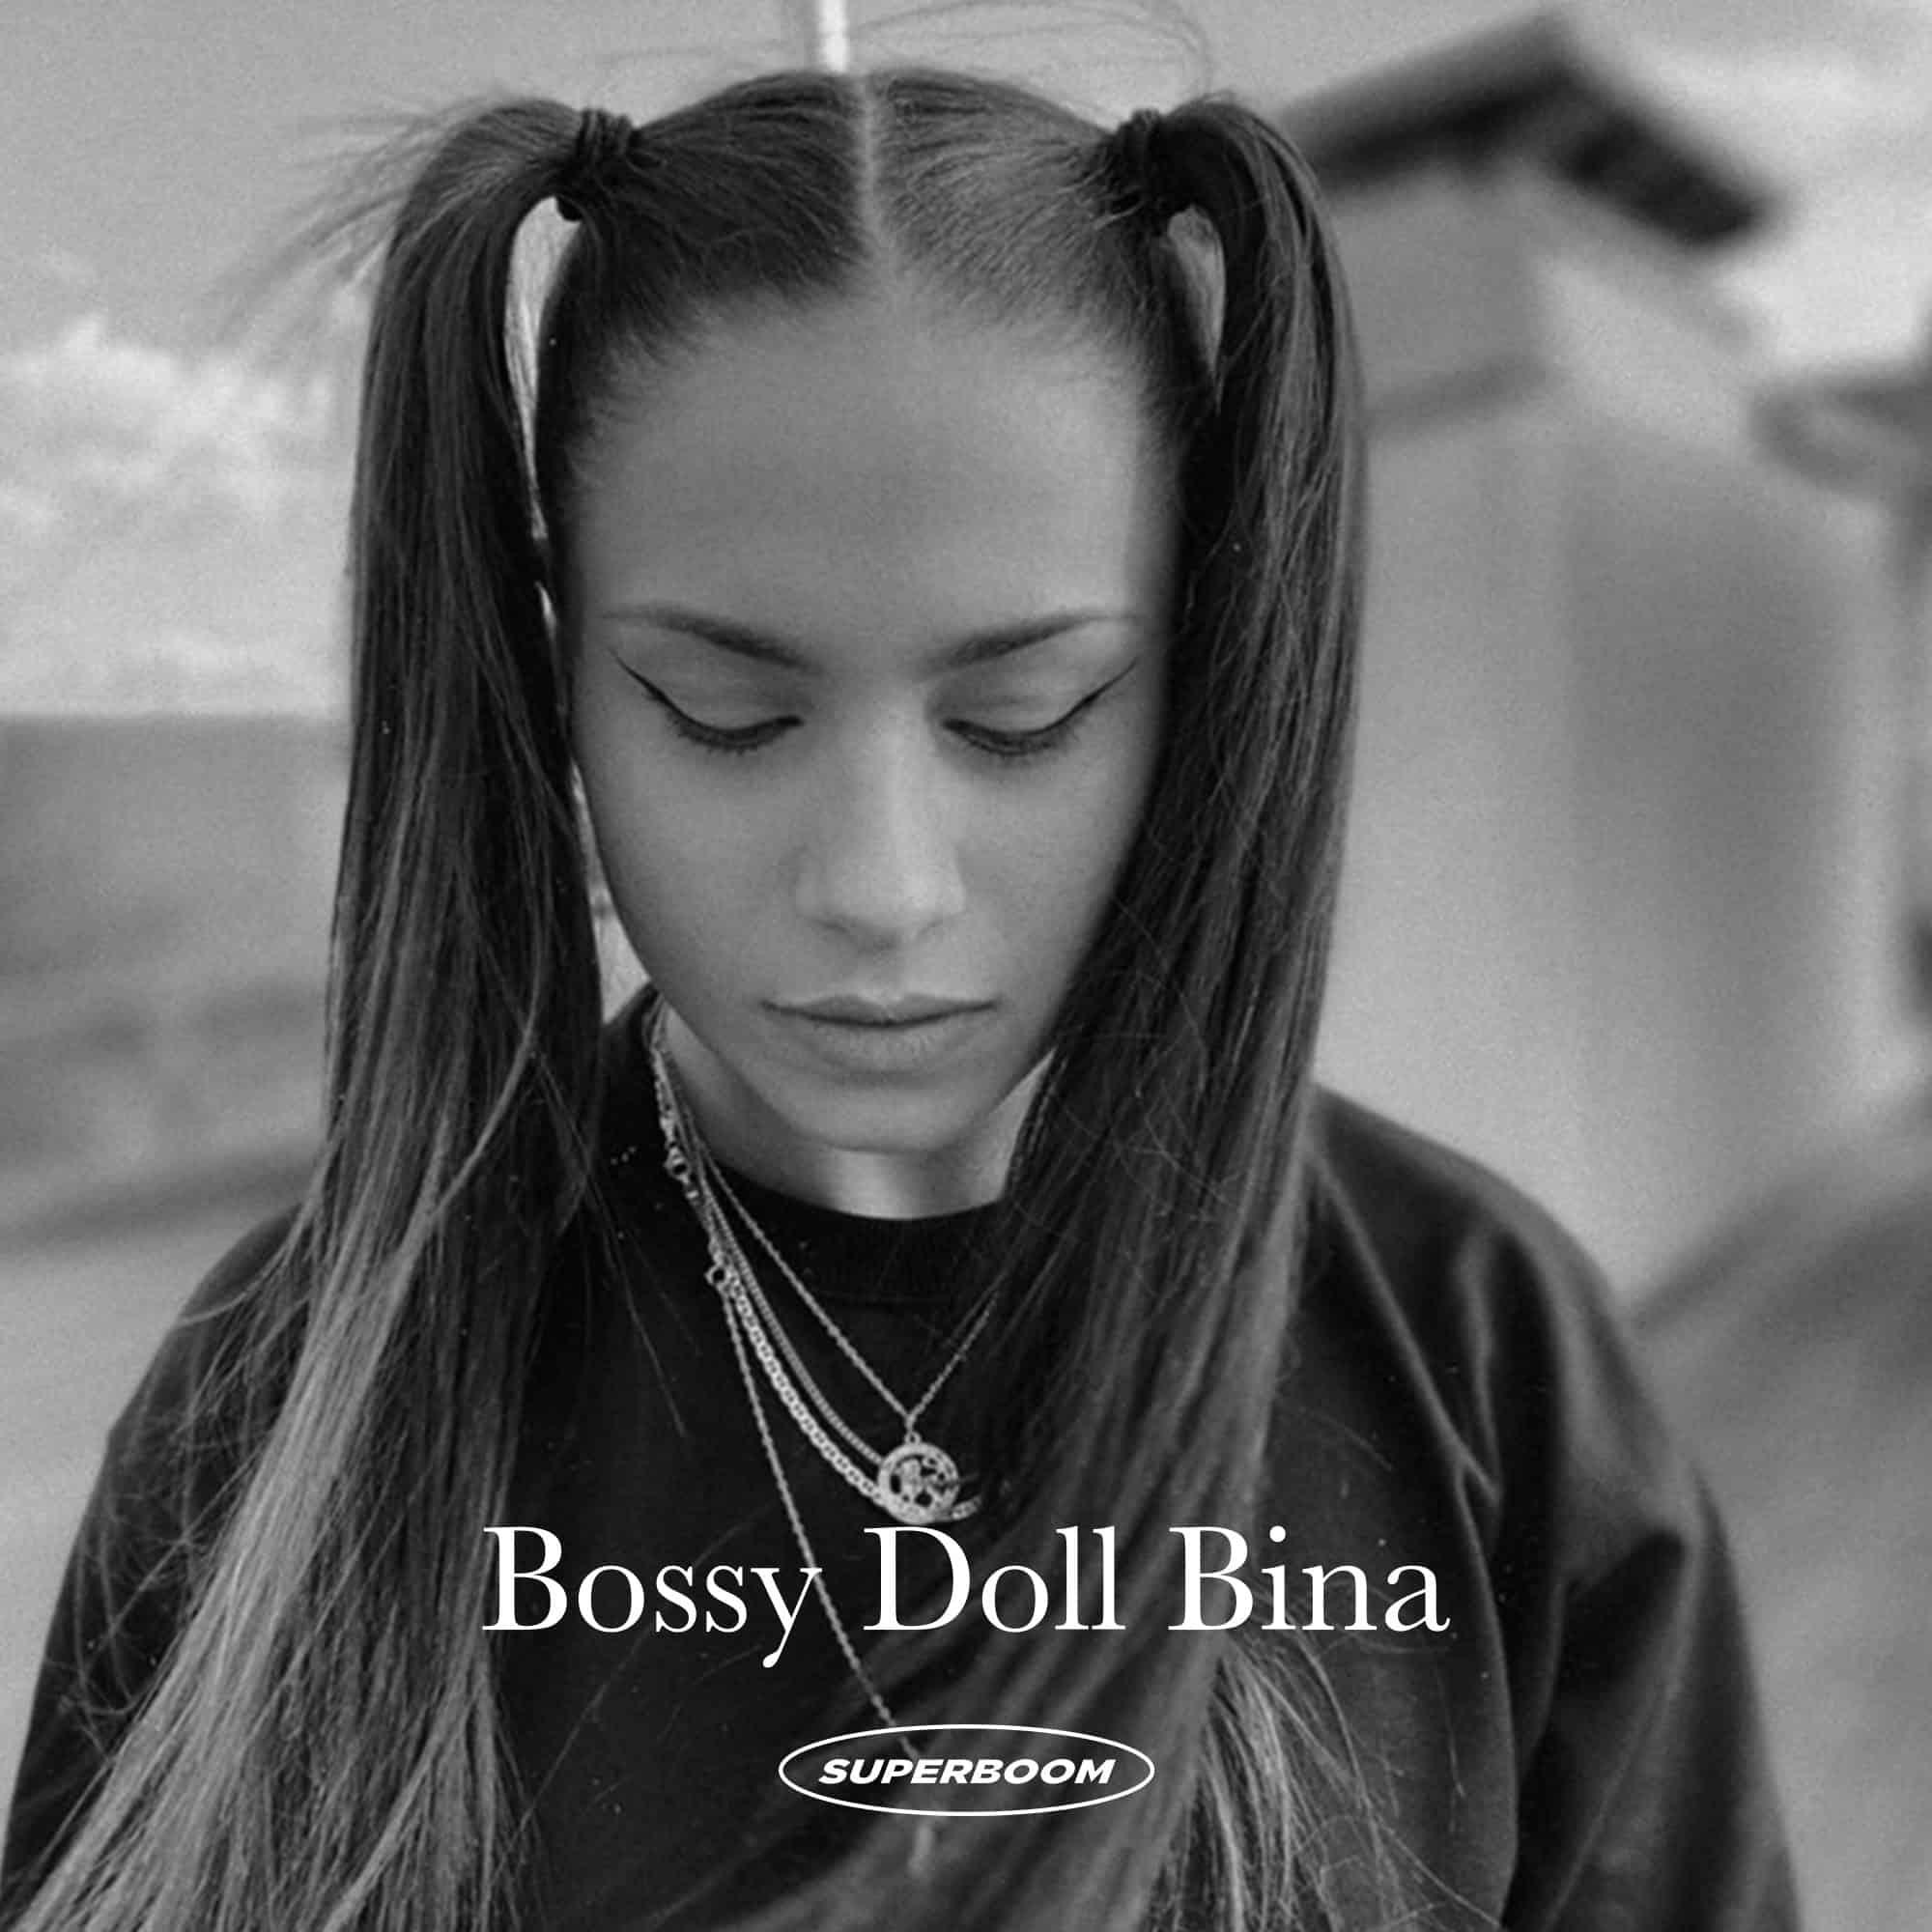 Bossy Doll Bina